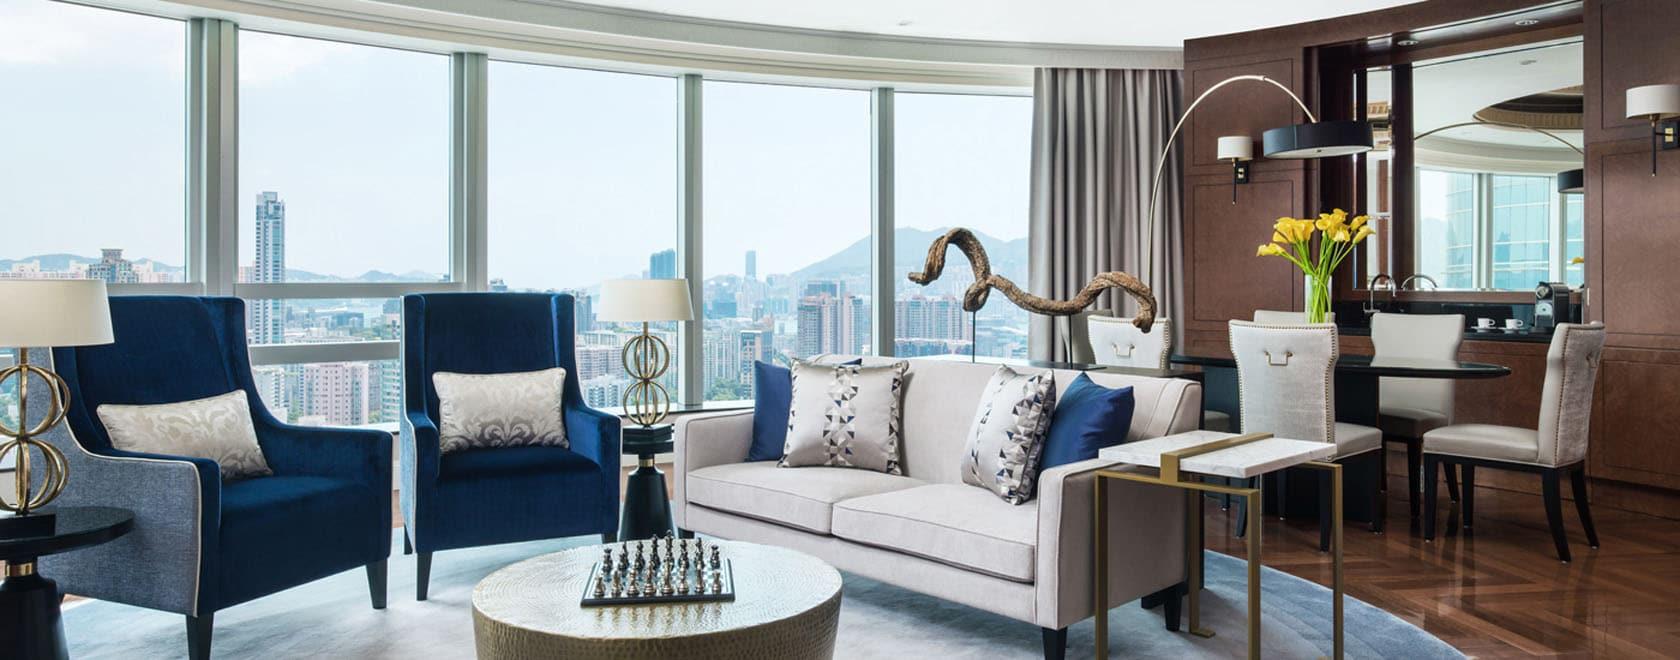 cordis club lounge hong kong hotel sofa